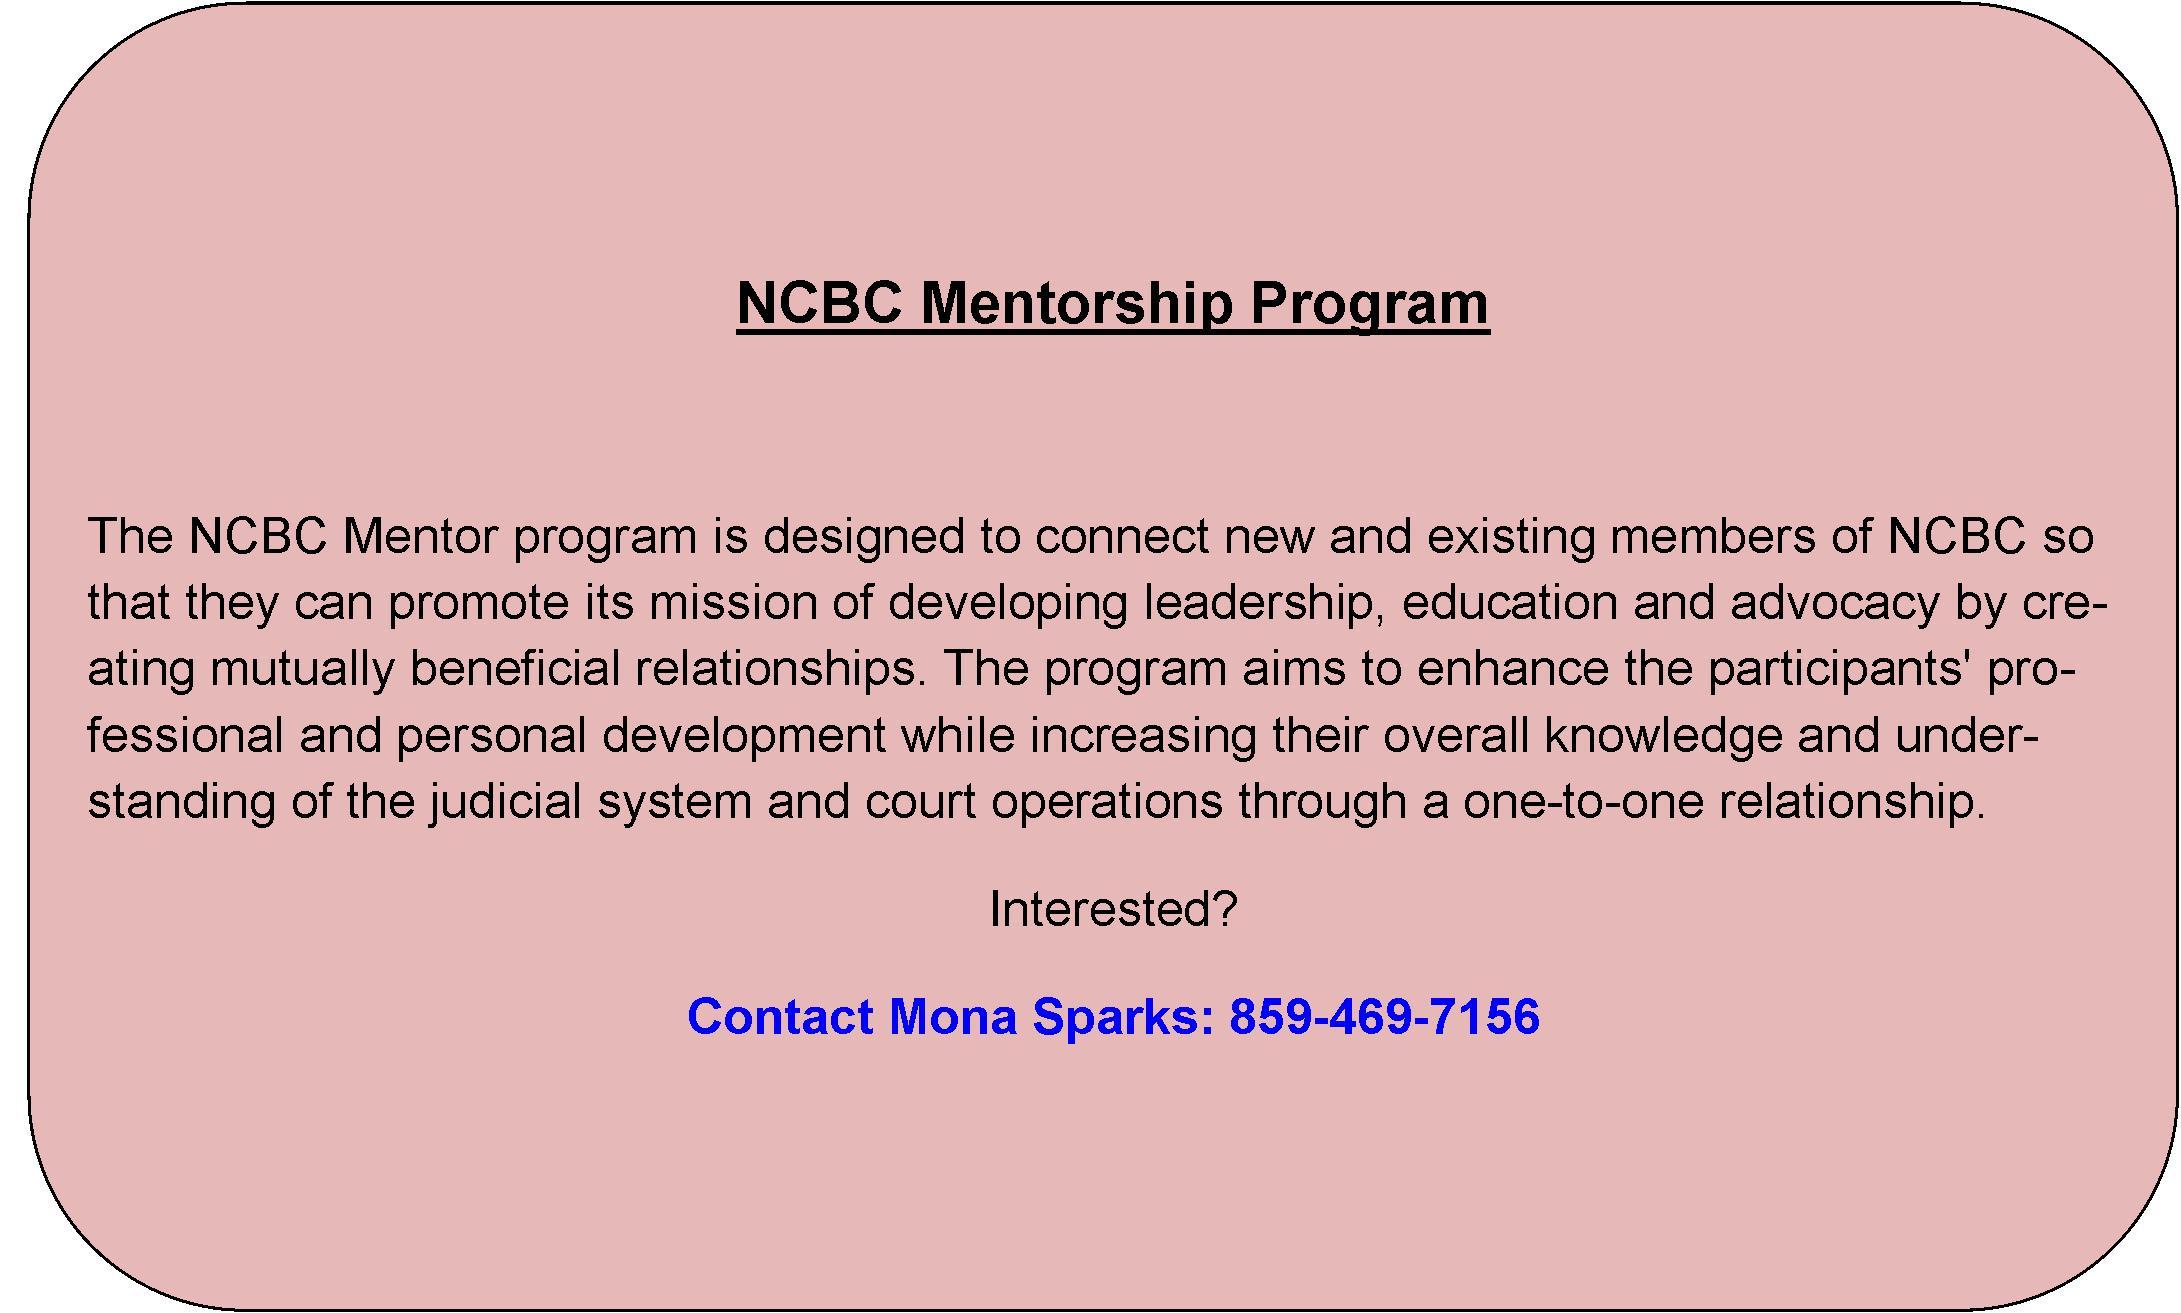 NCBC Mentorship Program.jpg